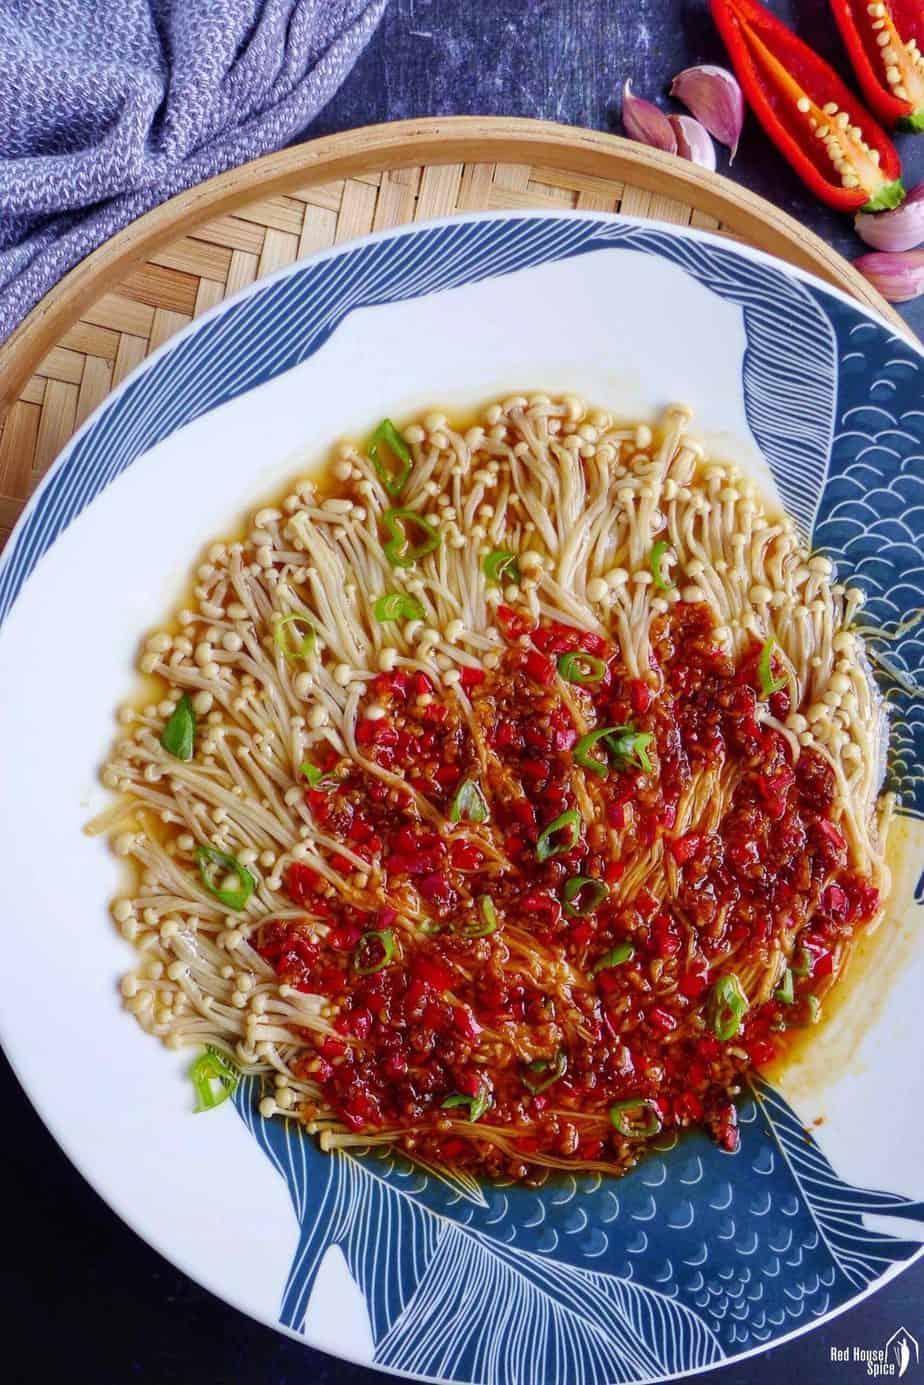 Steamed enoki mushroom with garlic chili sauce